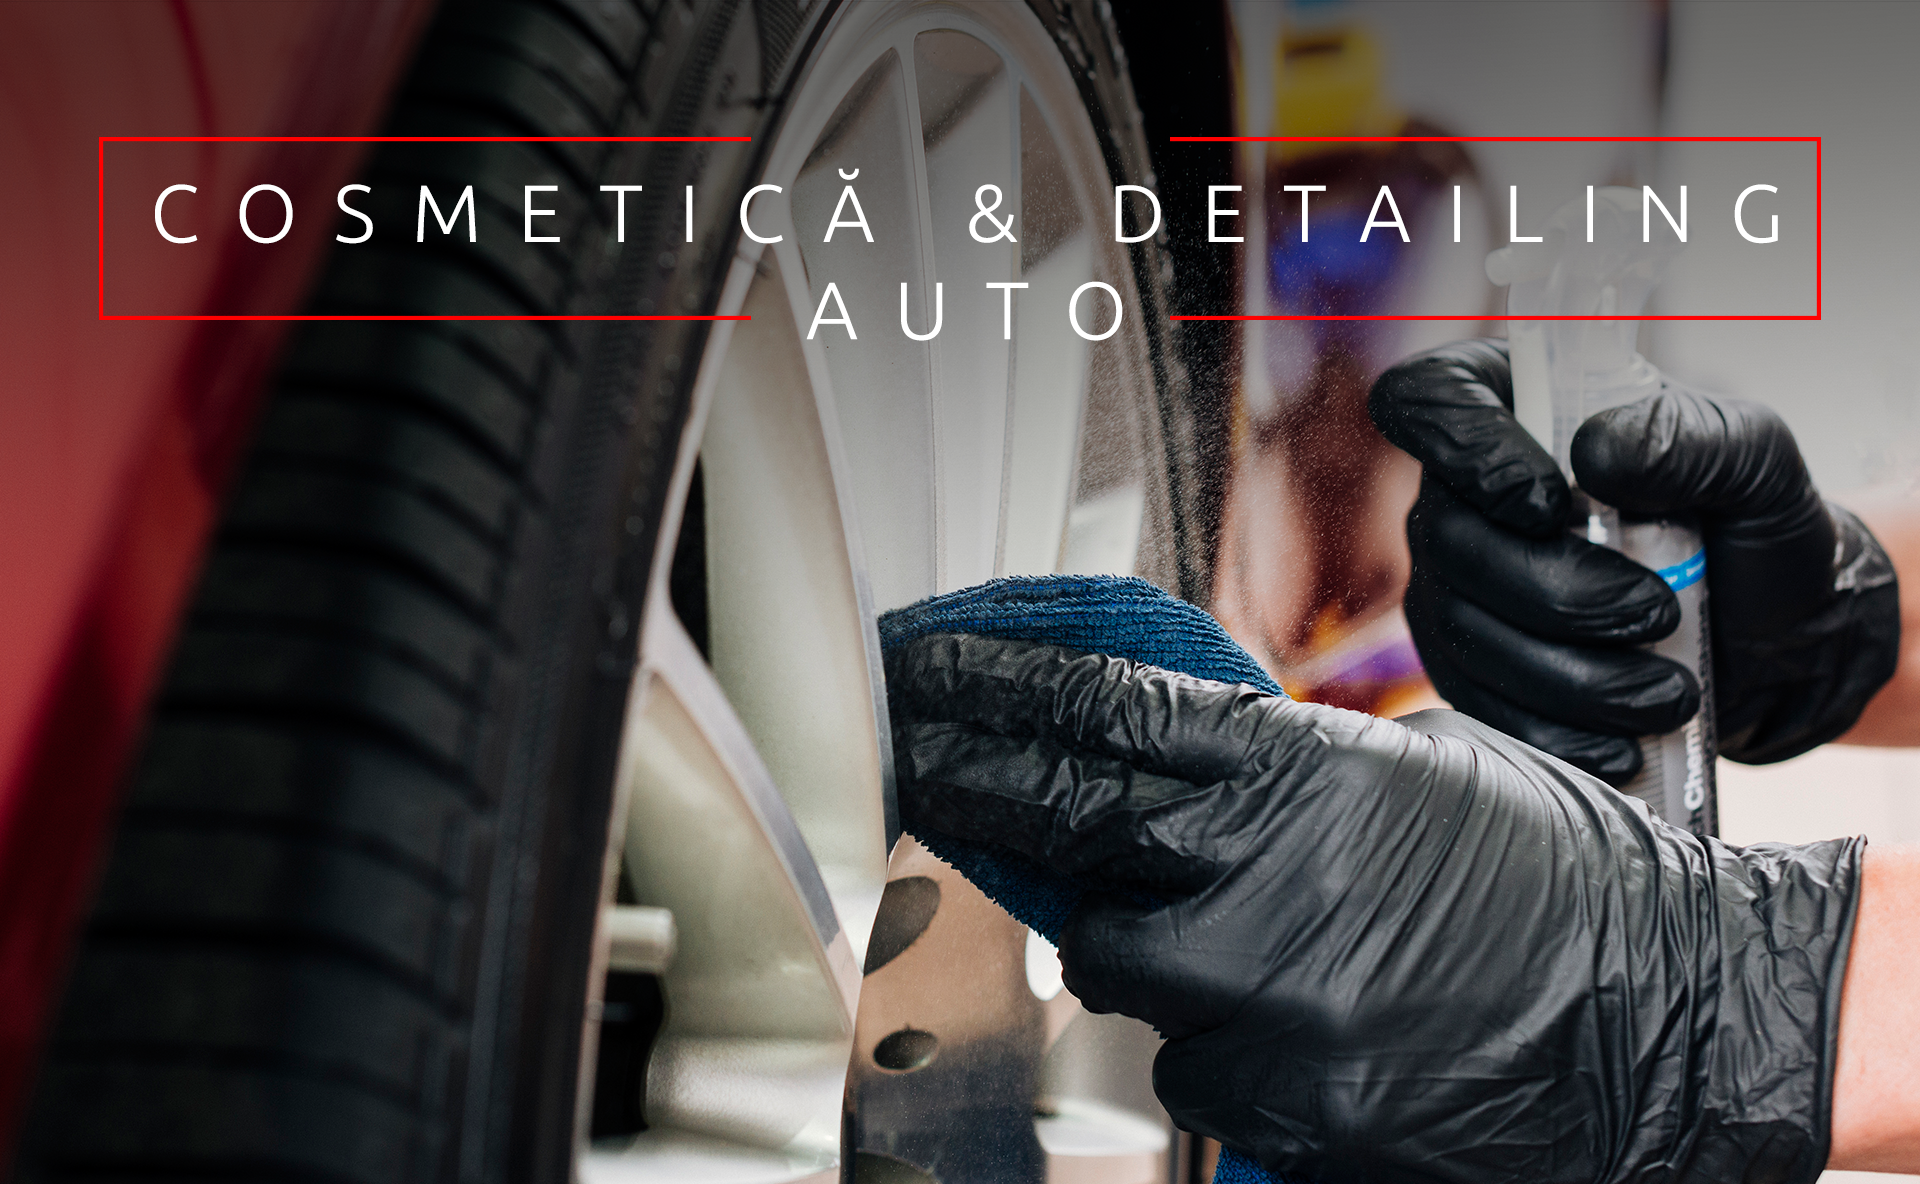 Cosmetica & detailing auto